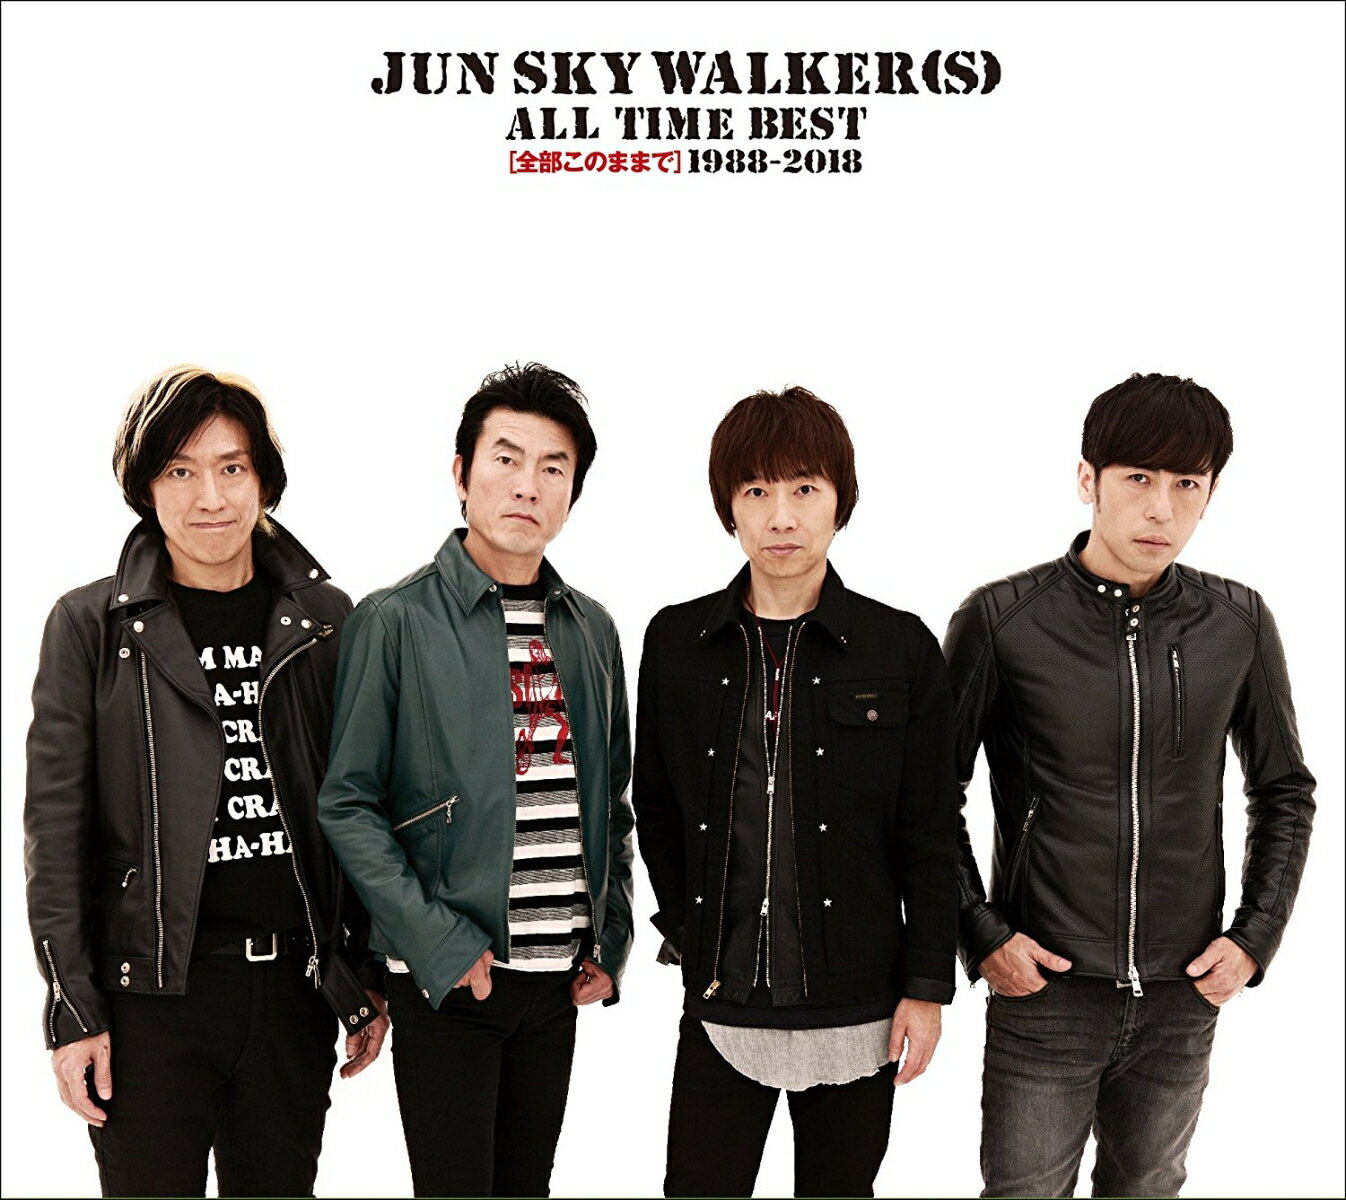 ALL TIME BEST〜全部このままで〜1988-2018 (初回限定盤 CD+DVD) [ JUN SKY WALKER(S) ]